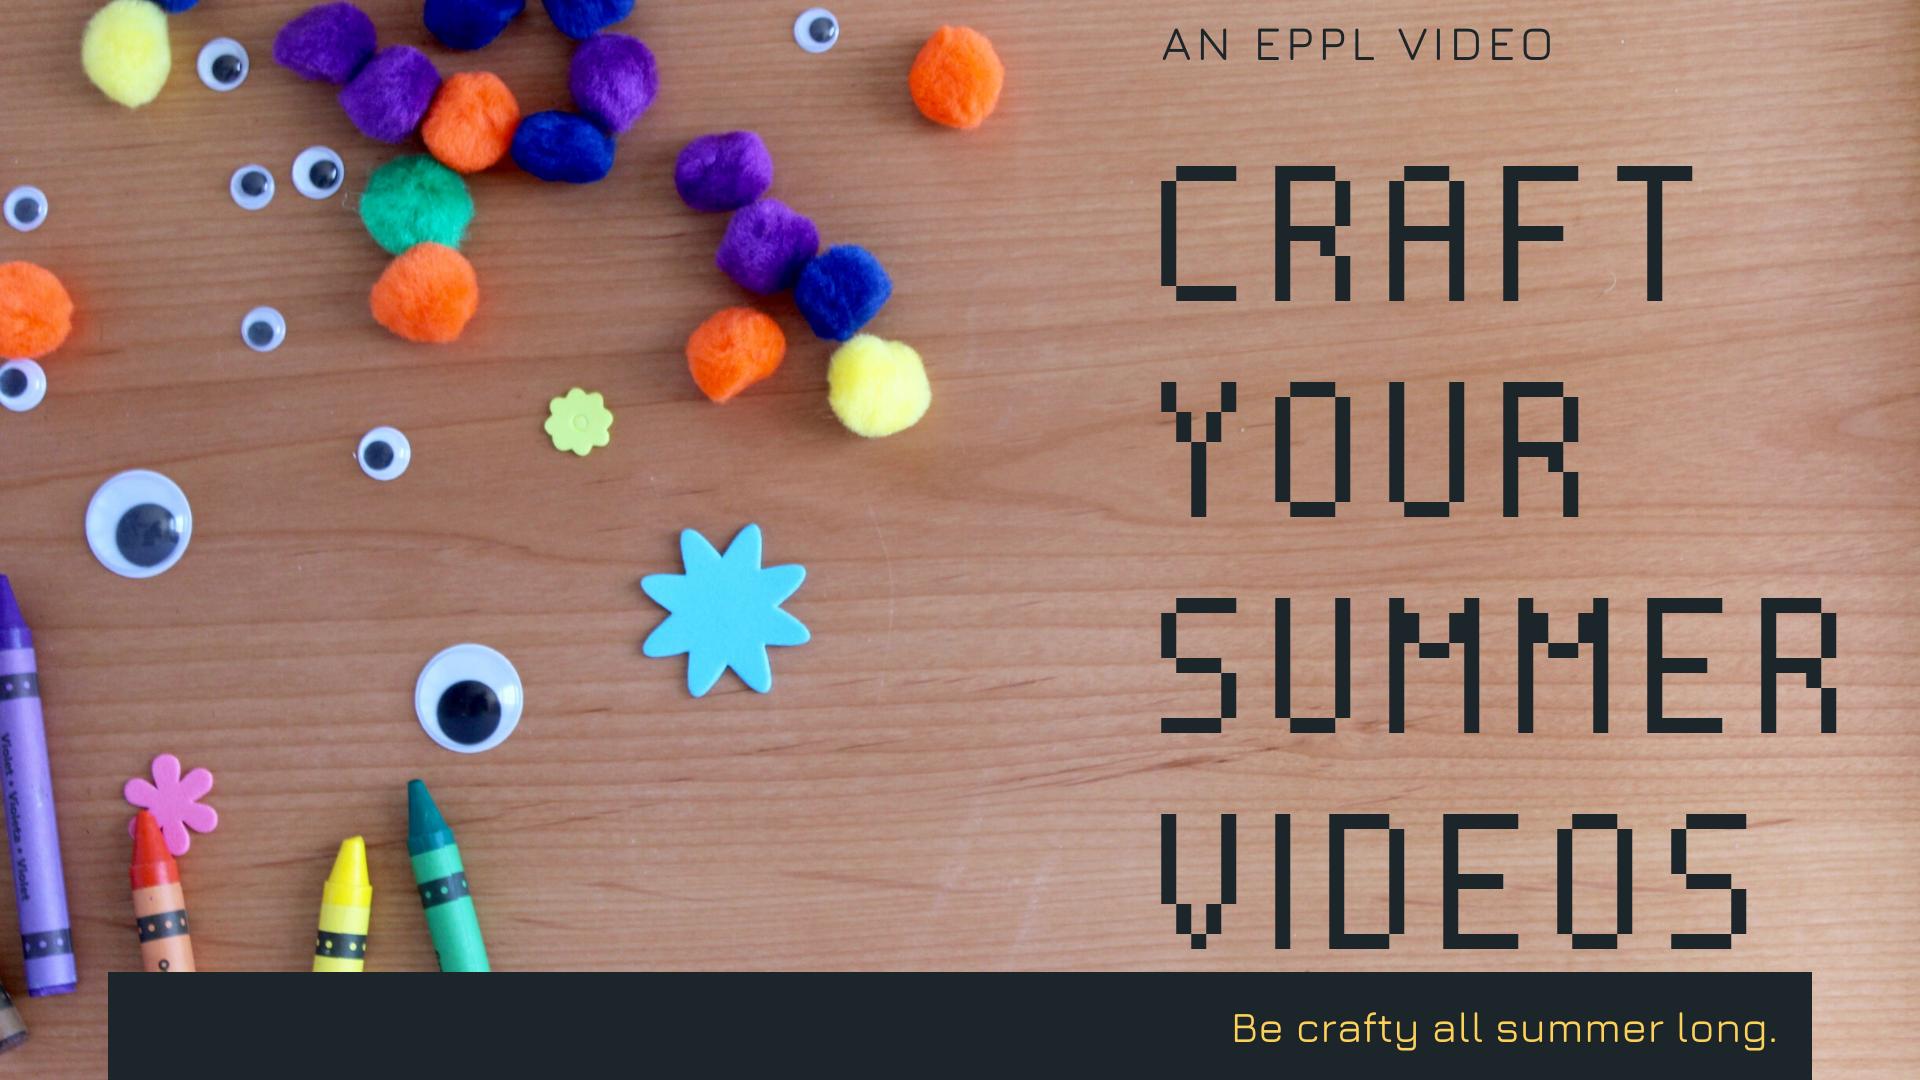 Craft Your Summer Videos